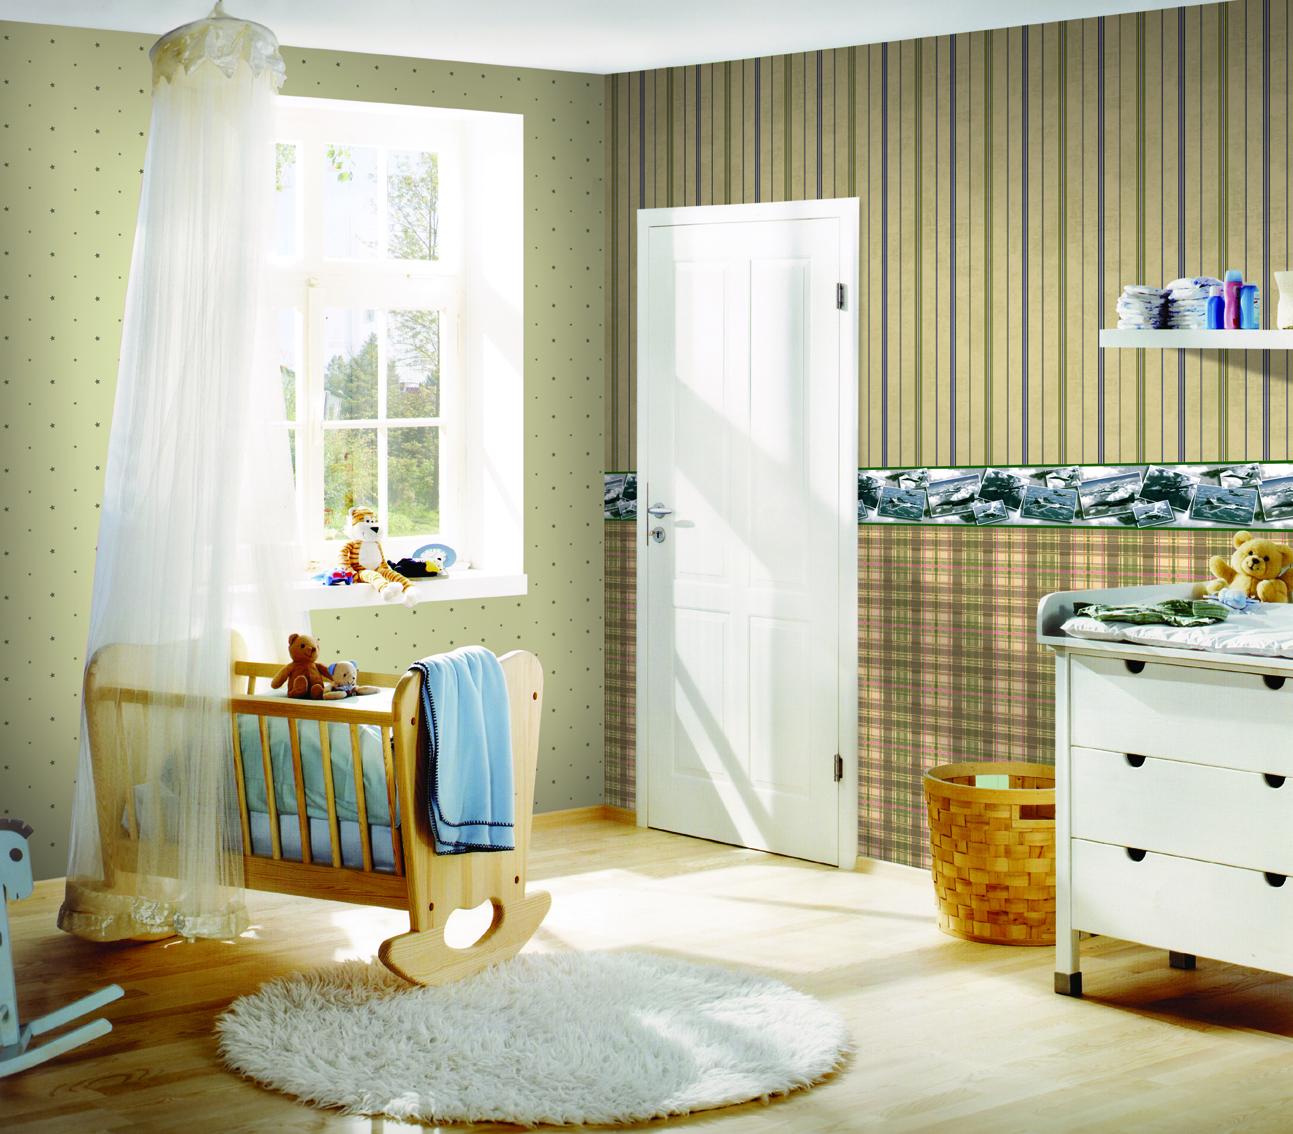 5 3 square living room 3d wallpaper 3d effect wallpaper for 3d effect wallpaper for home